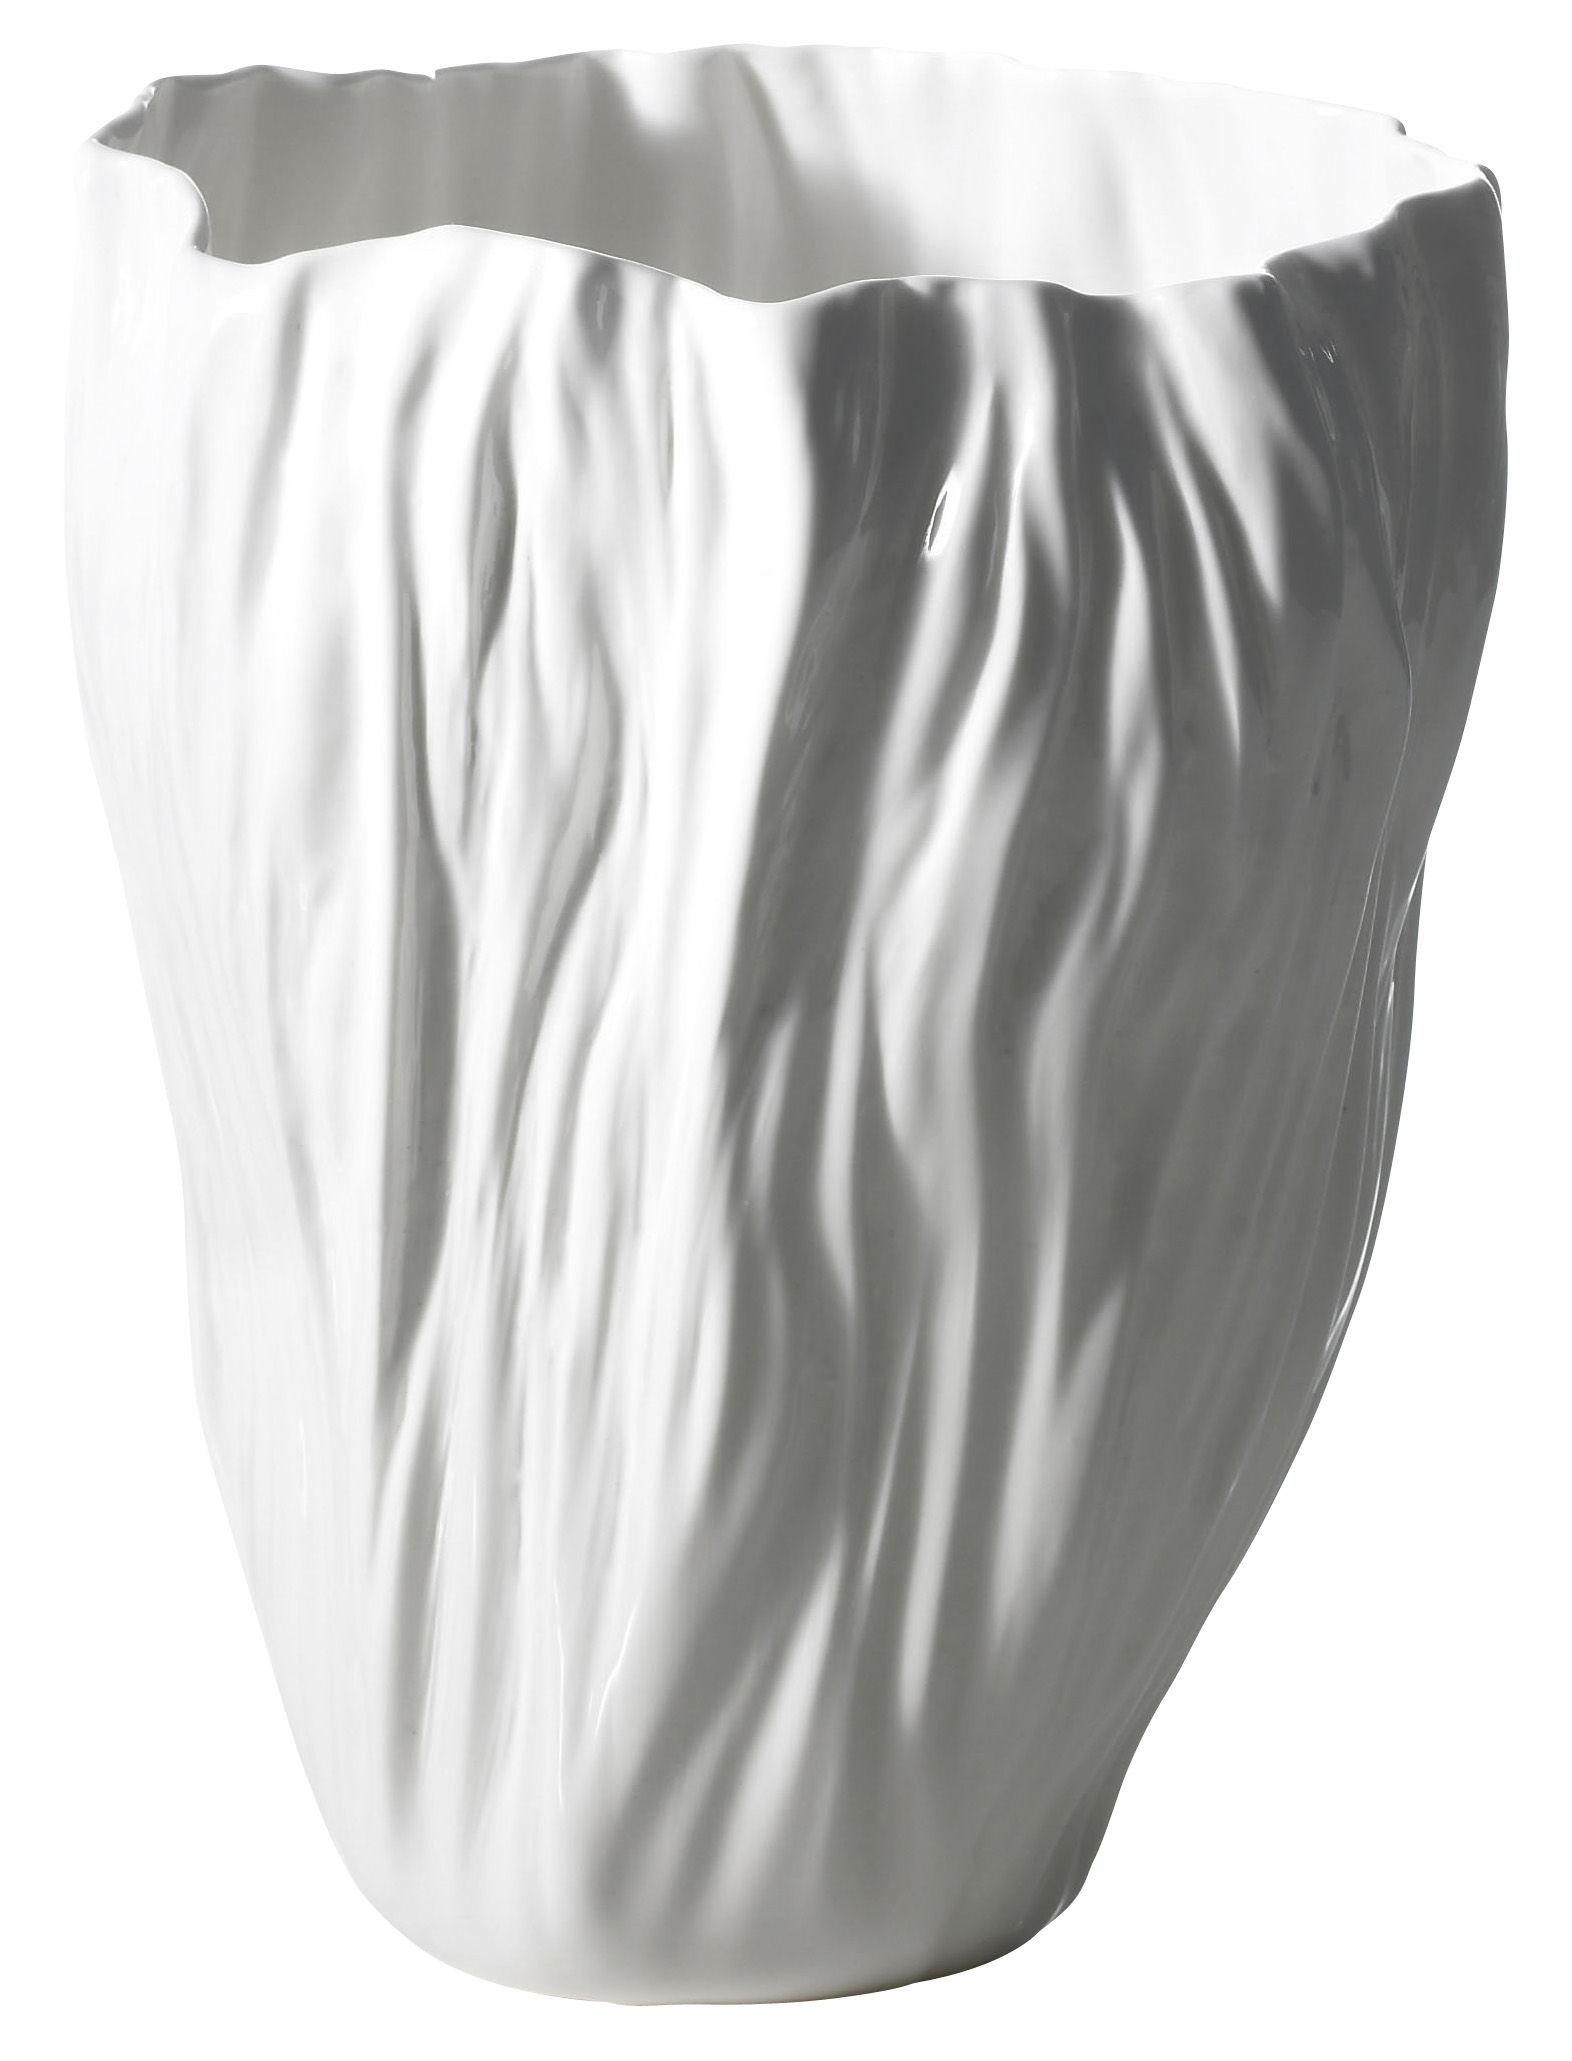 Déco - Vases - Vase Adelaïde IV - Driade Kosmo - Blanc - Porcelaine Bone China